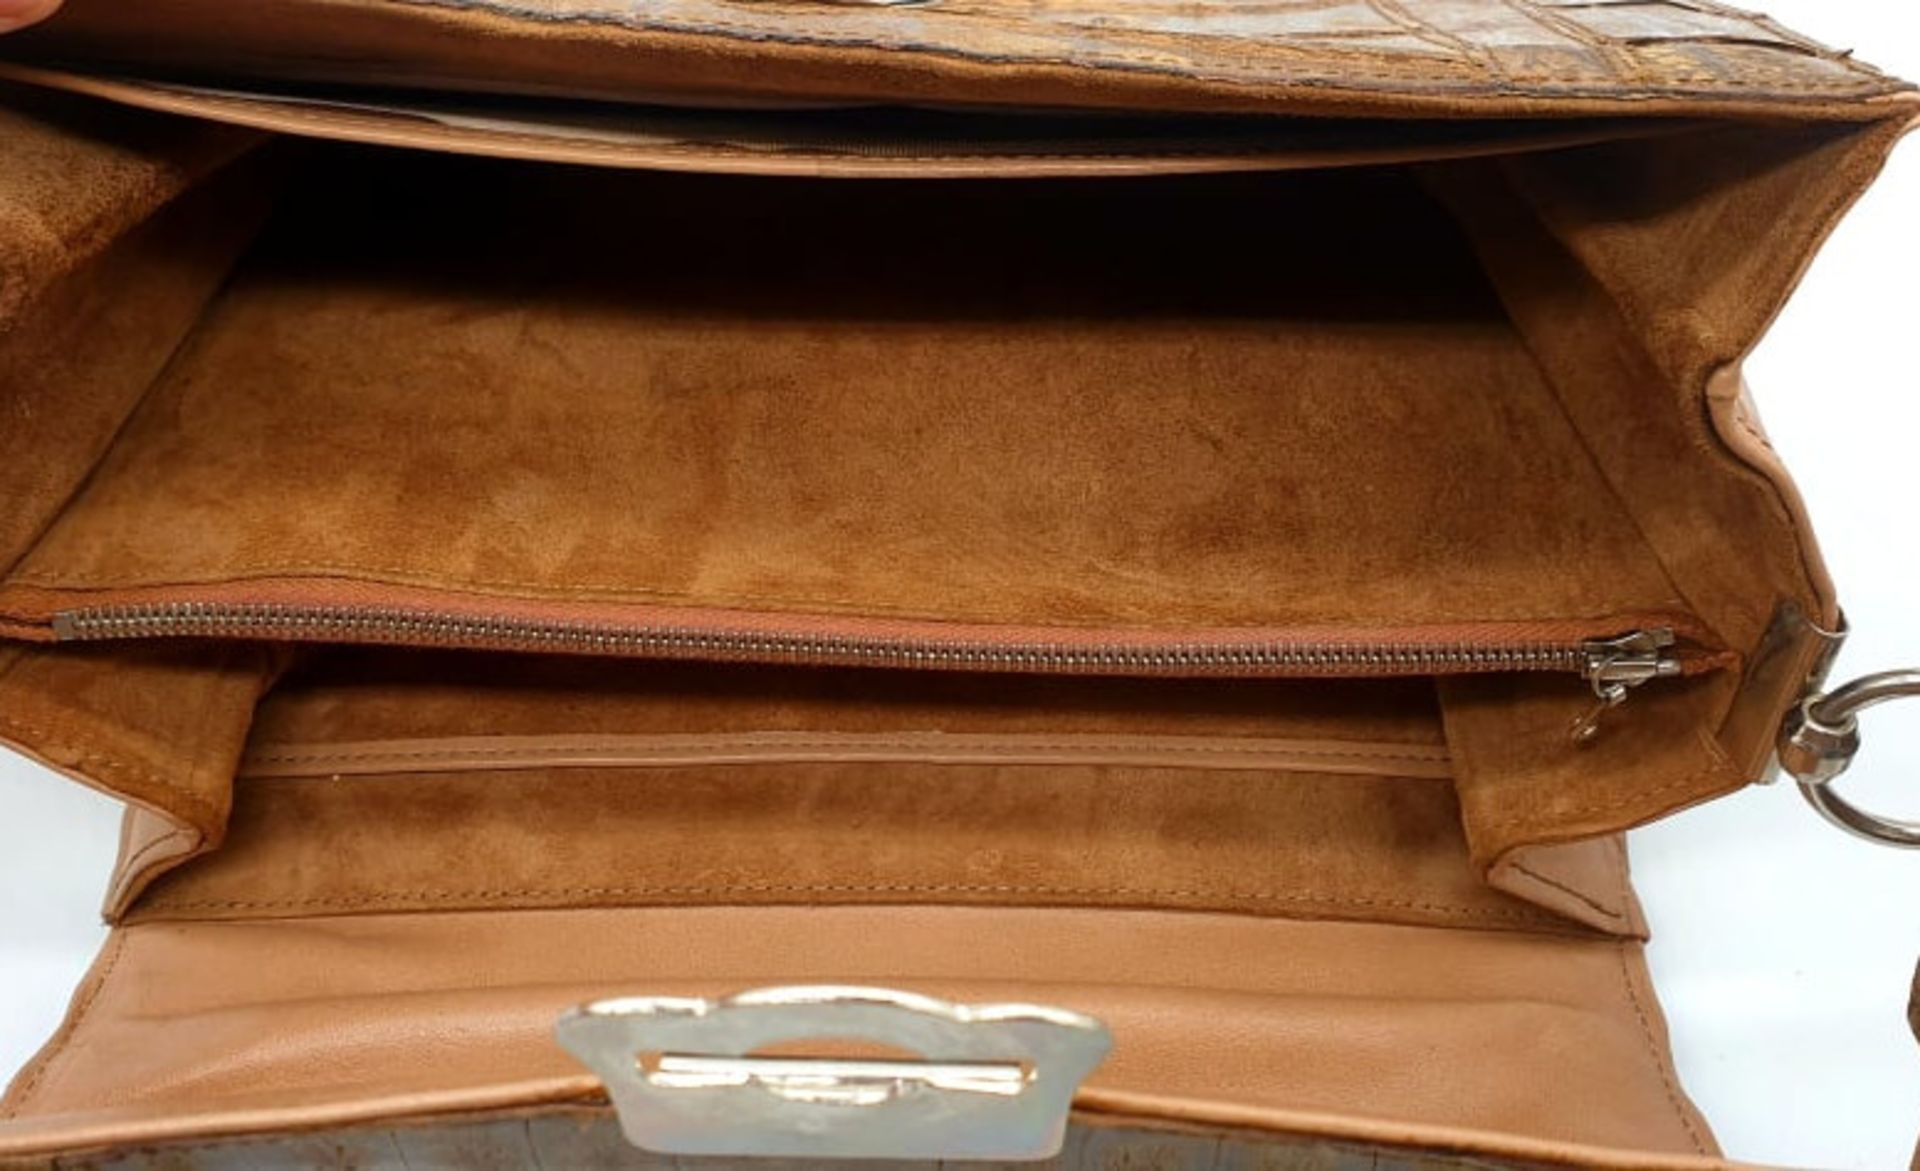 Brown Croco Handbag - Bild 7 aus 8